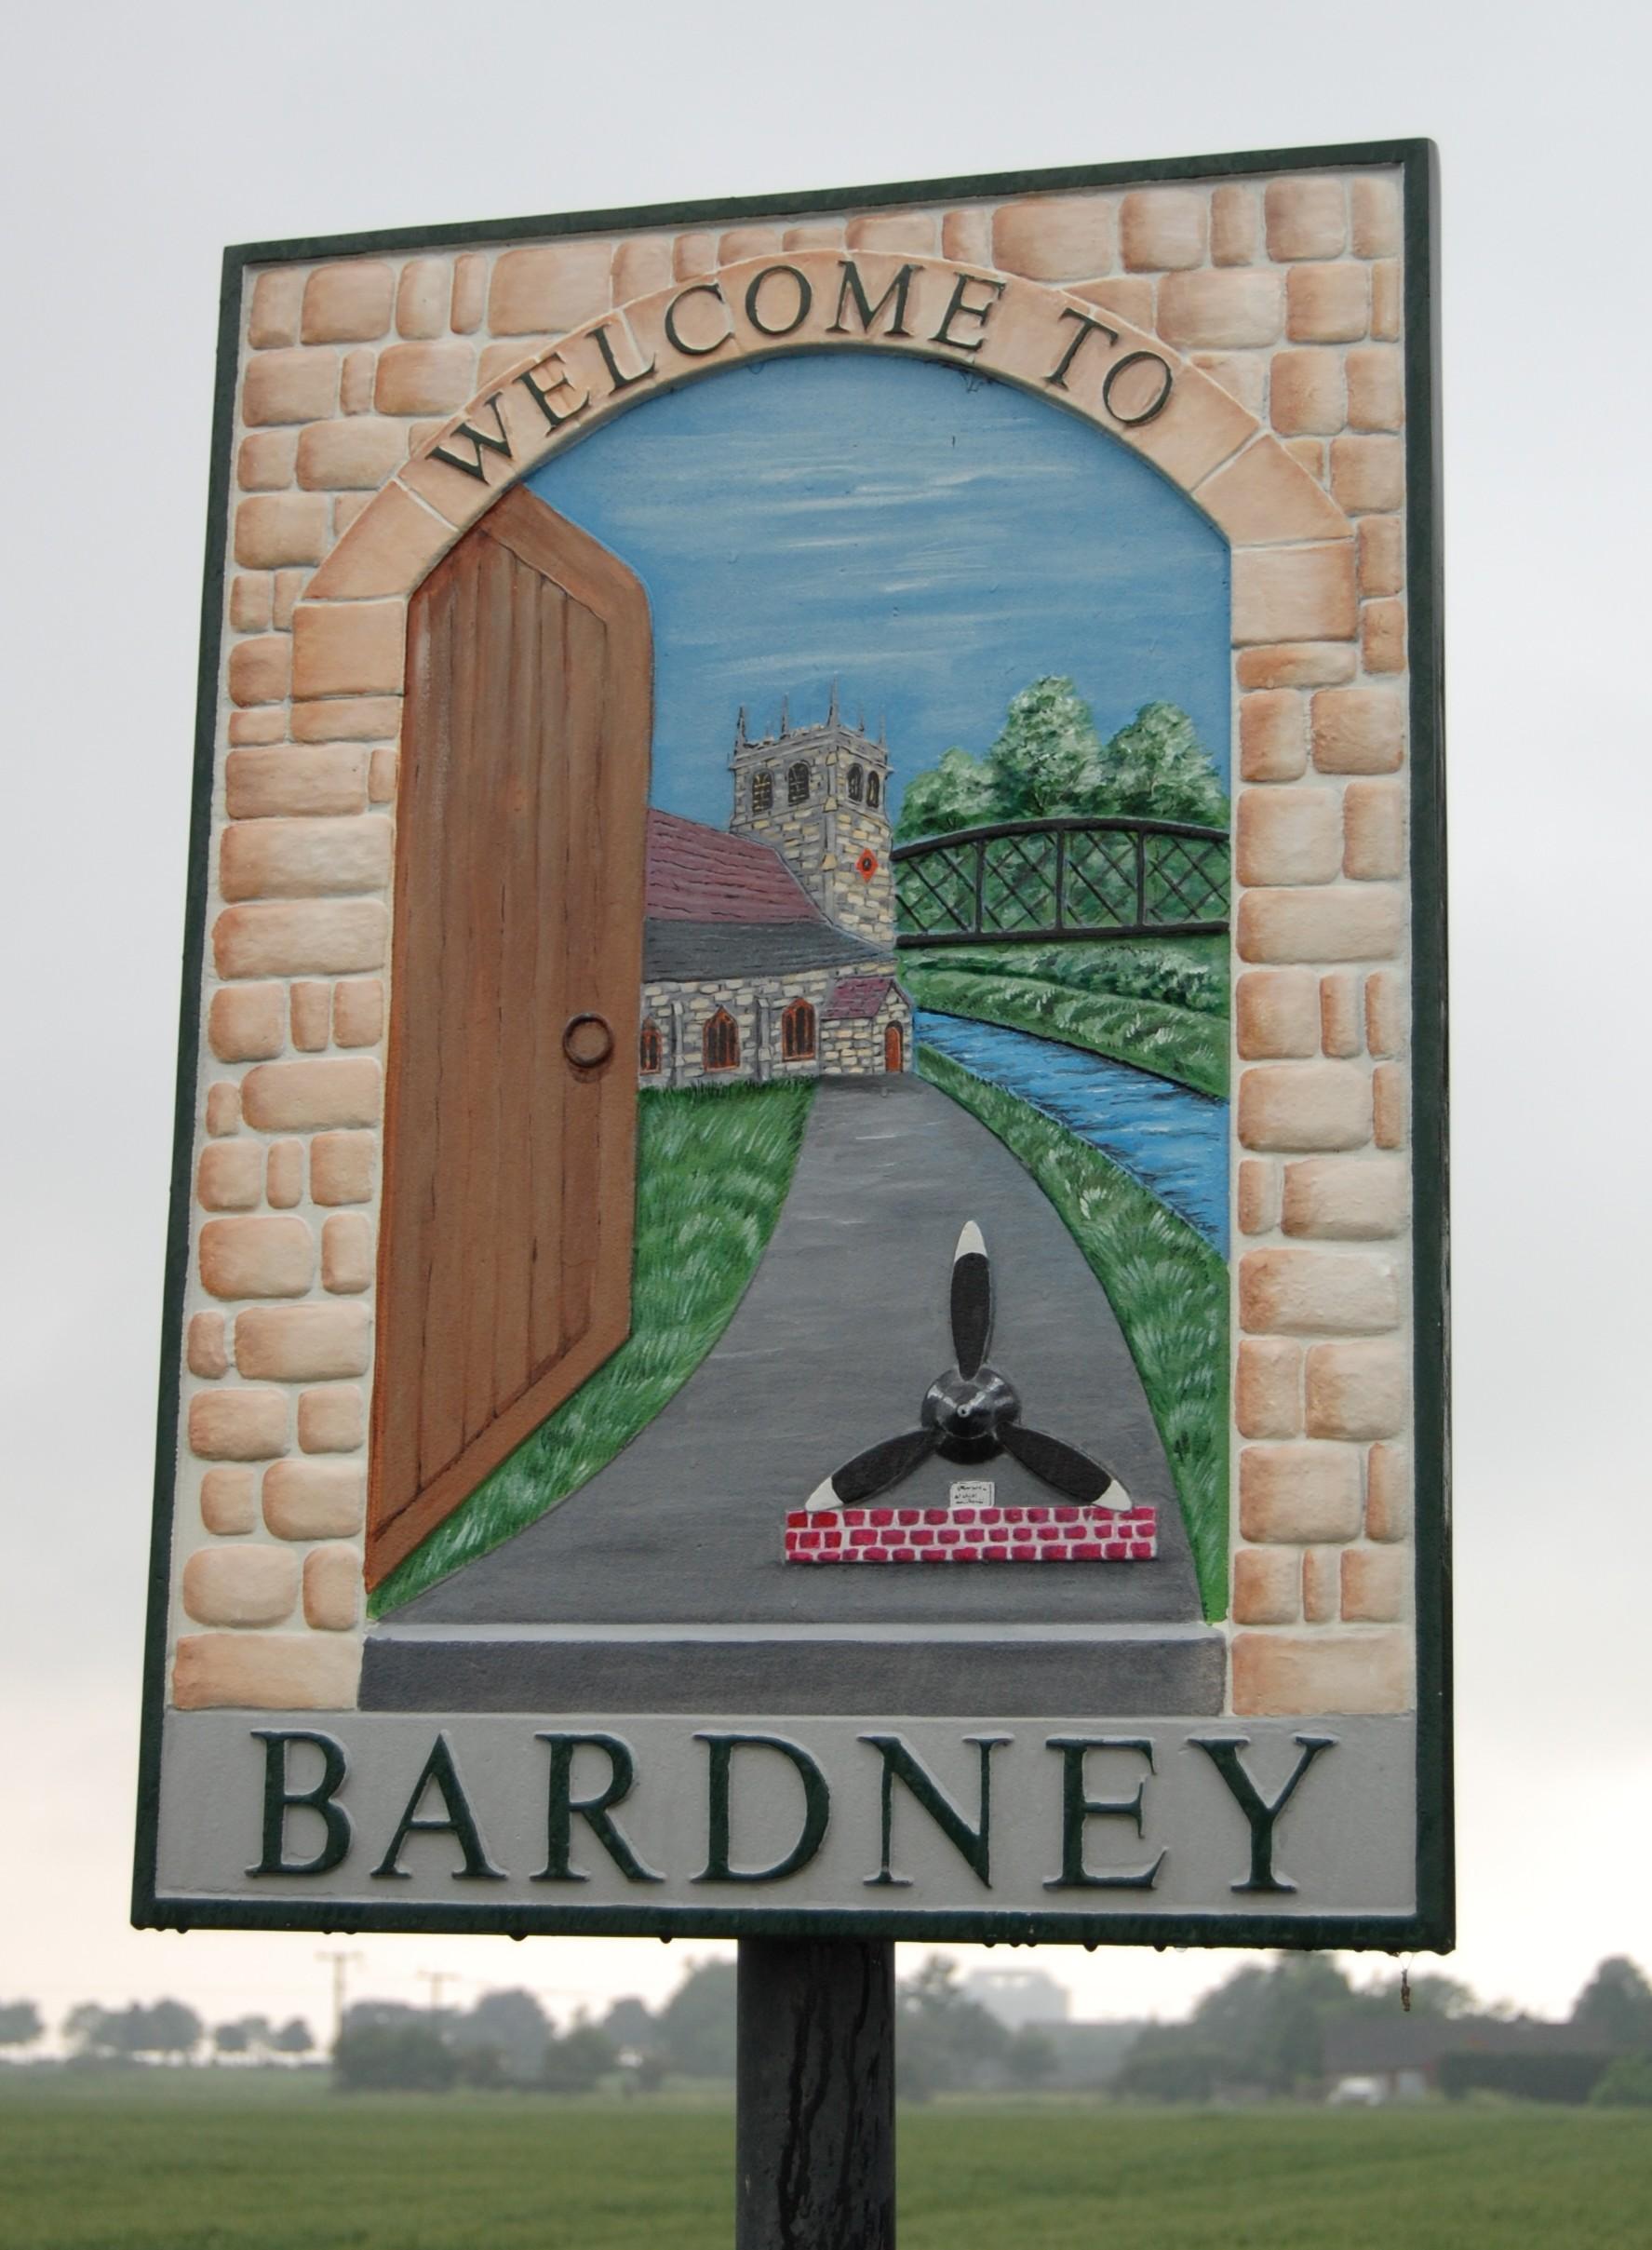 Bardney village sign closeup